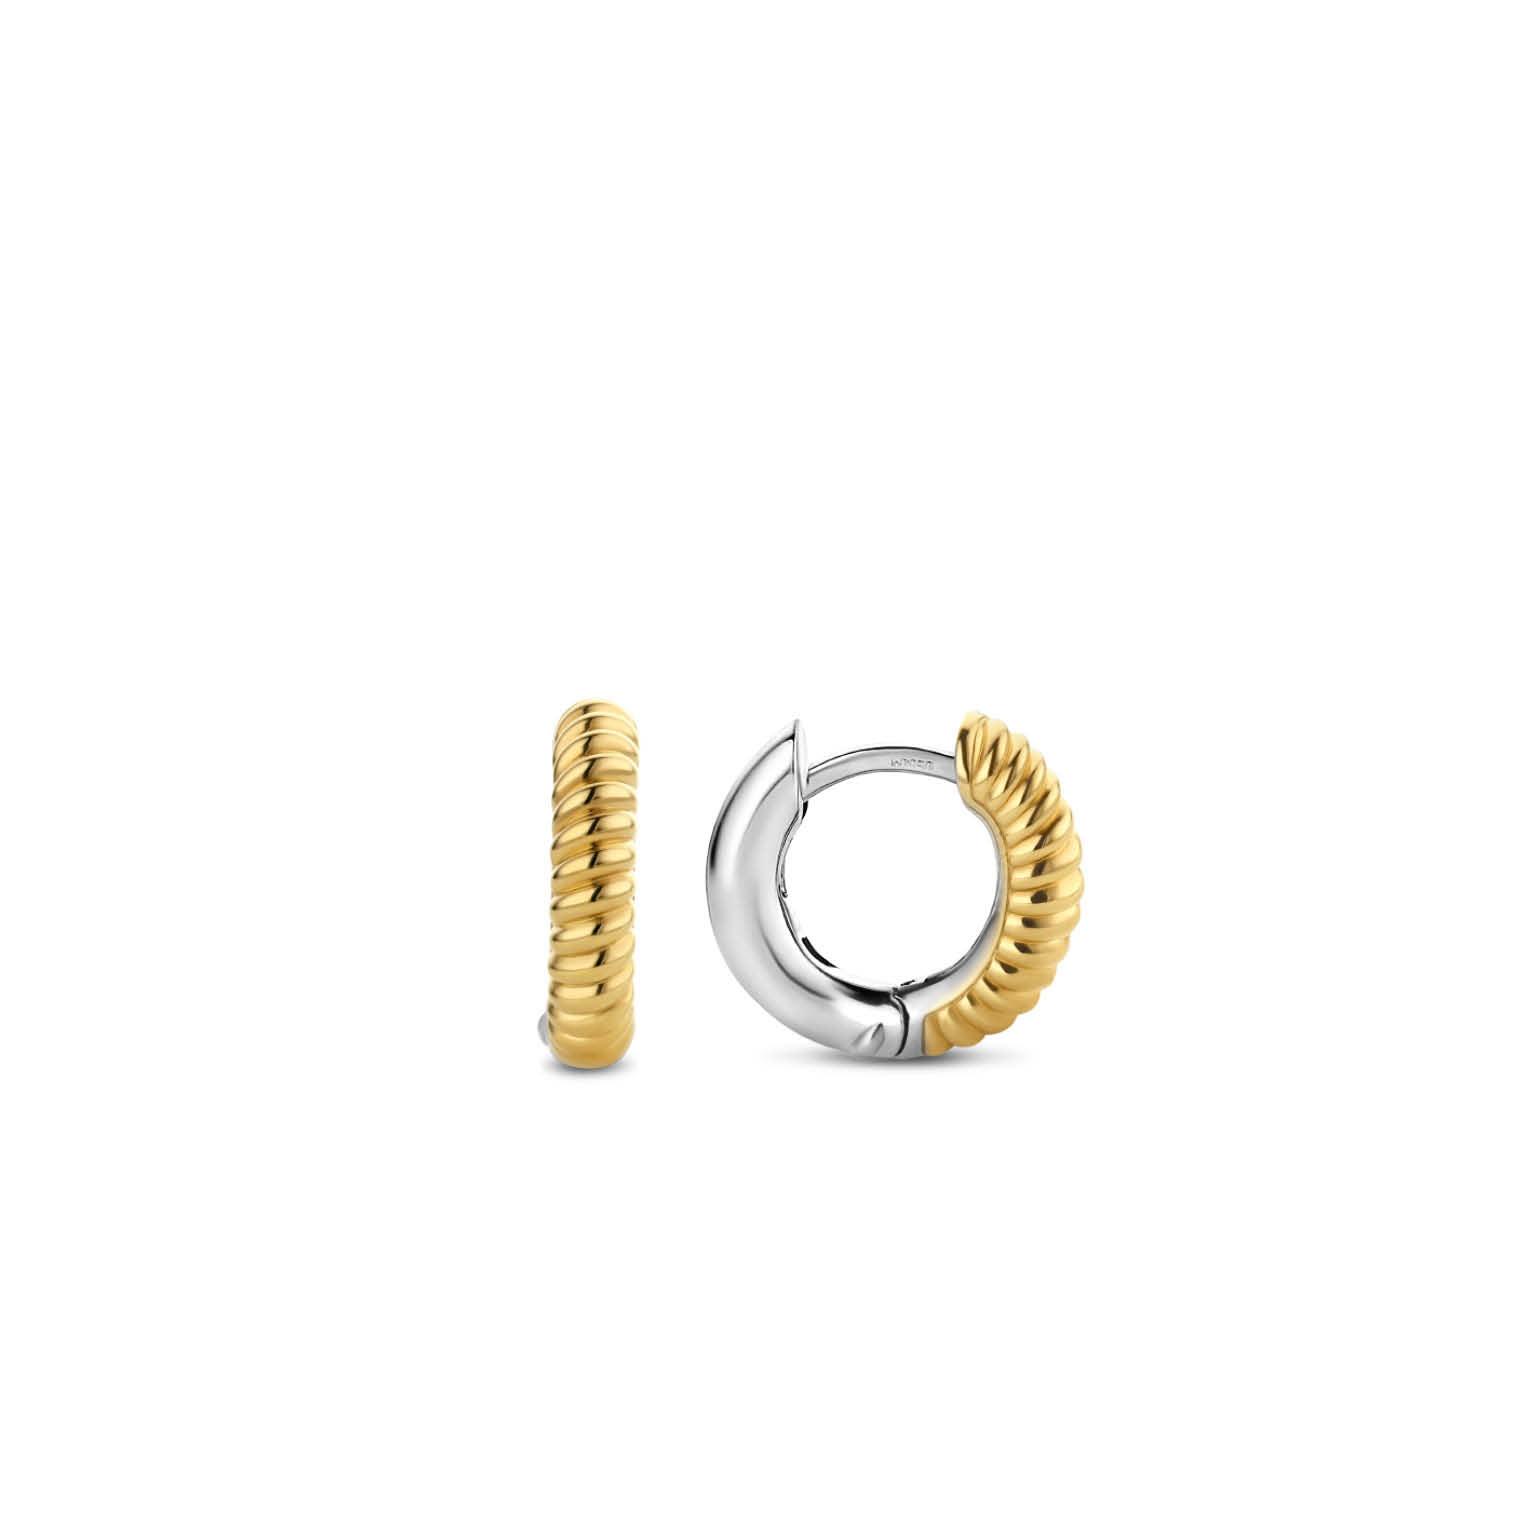 TI SENTO - Milano Earrings 7210YT-4